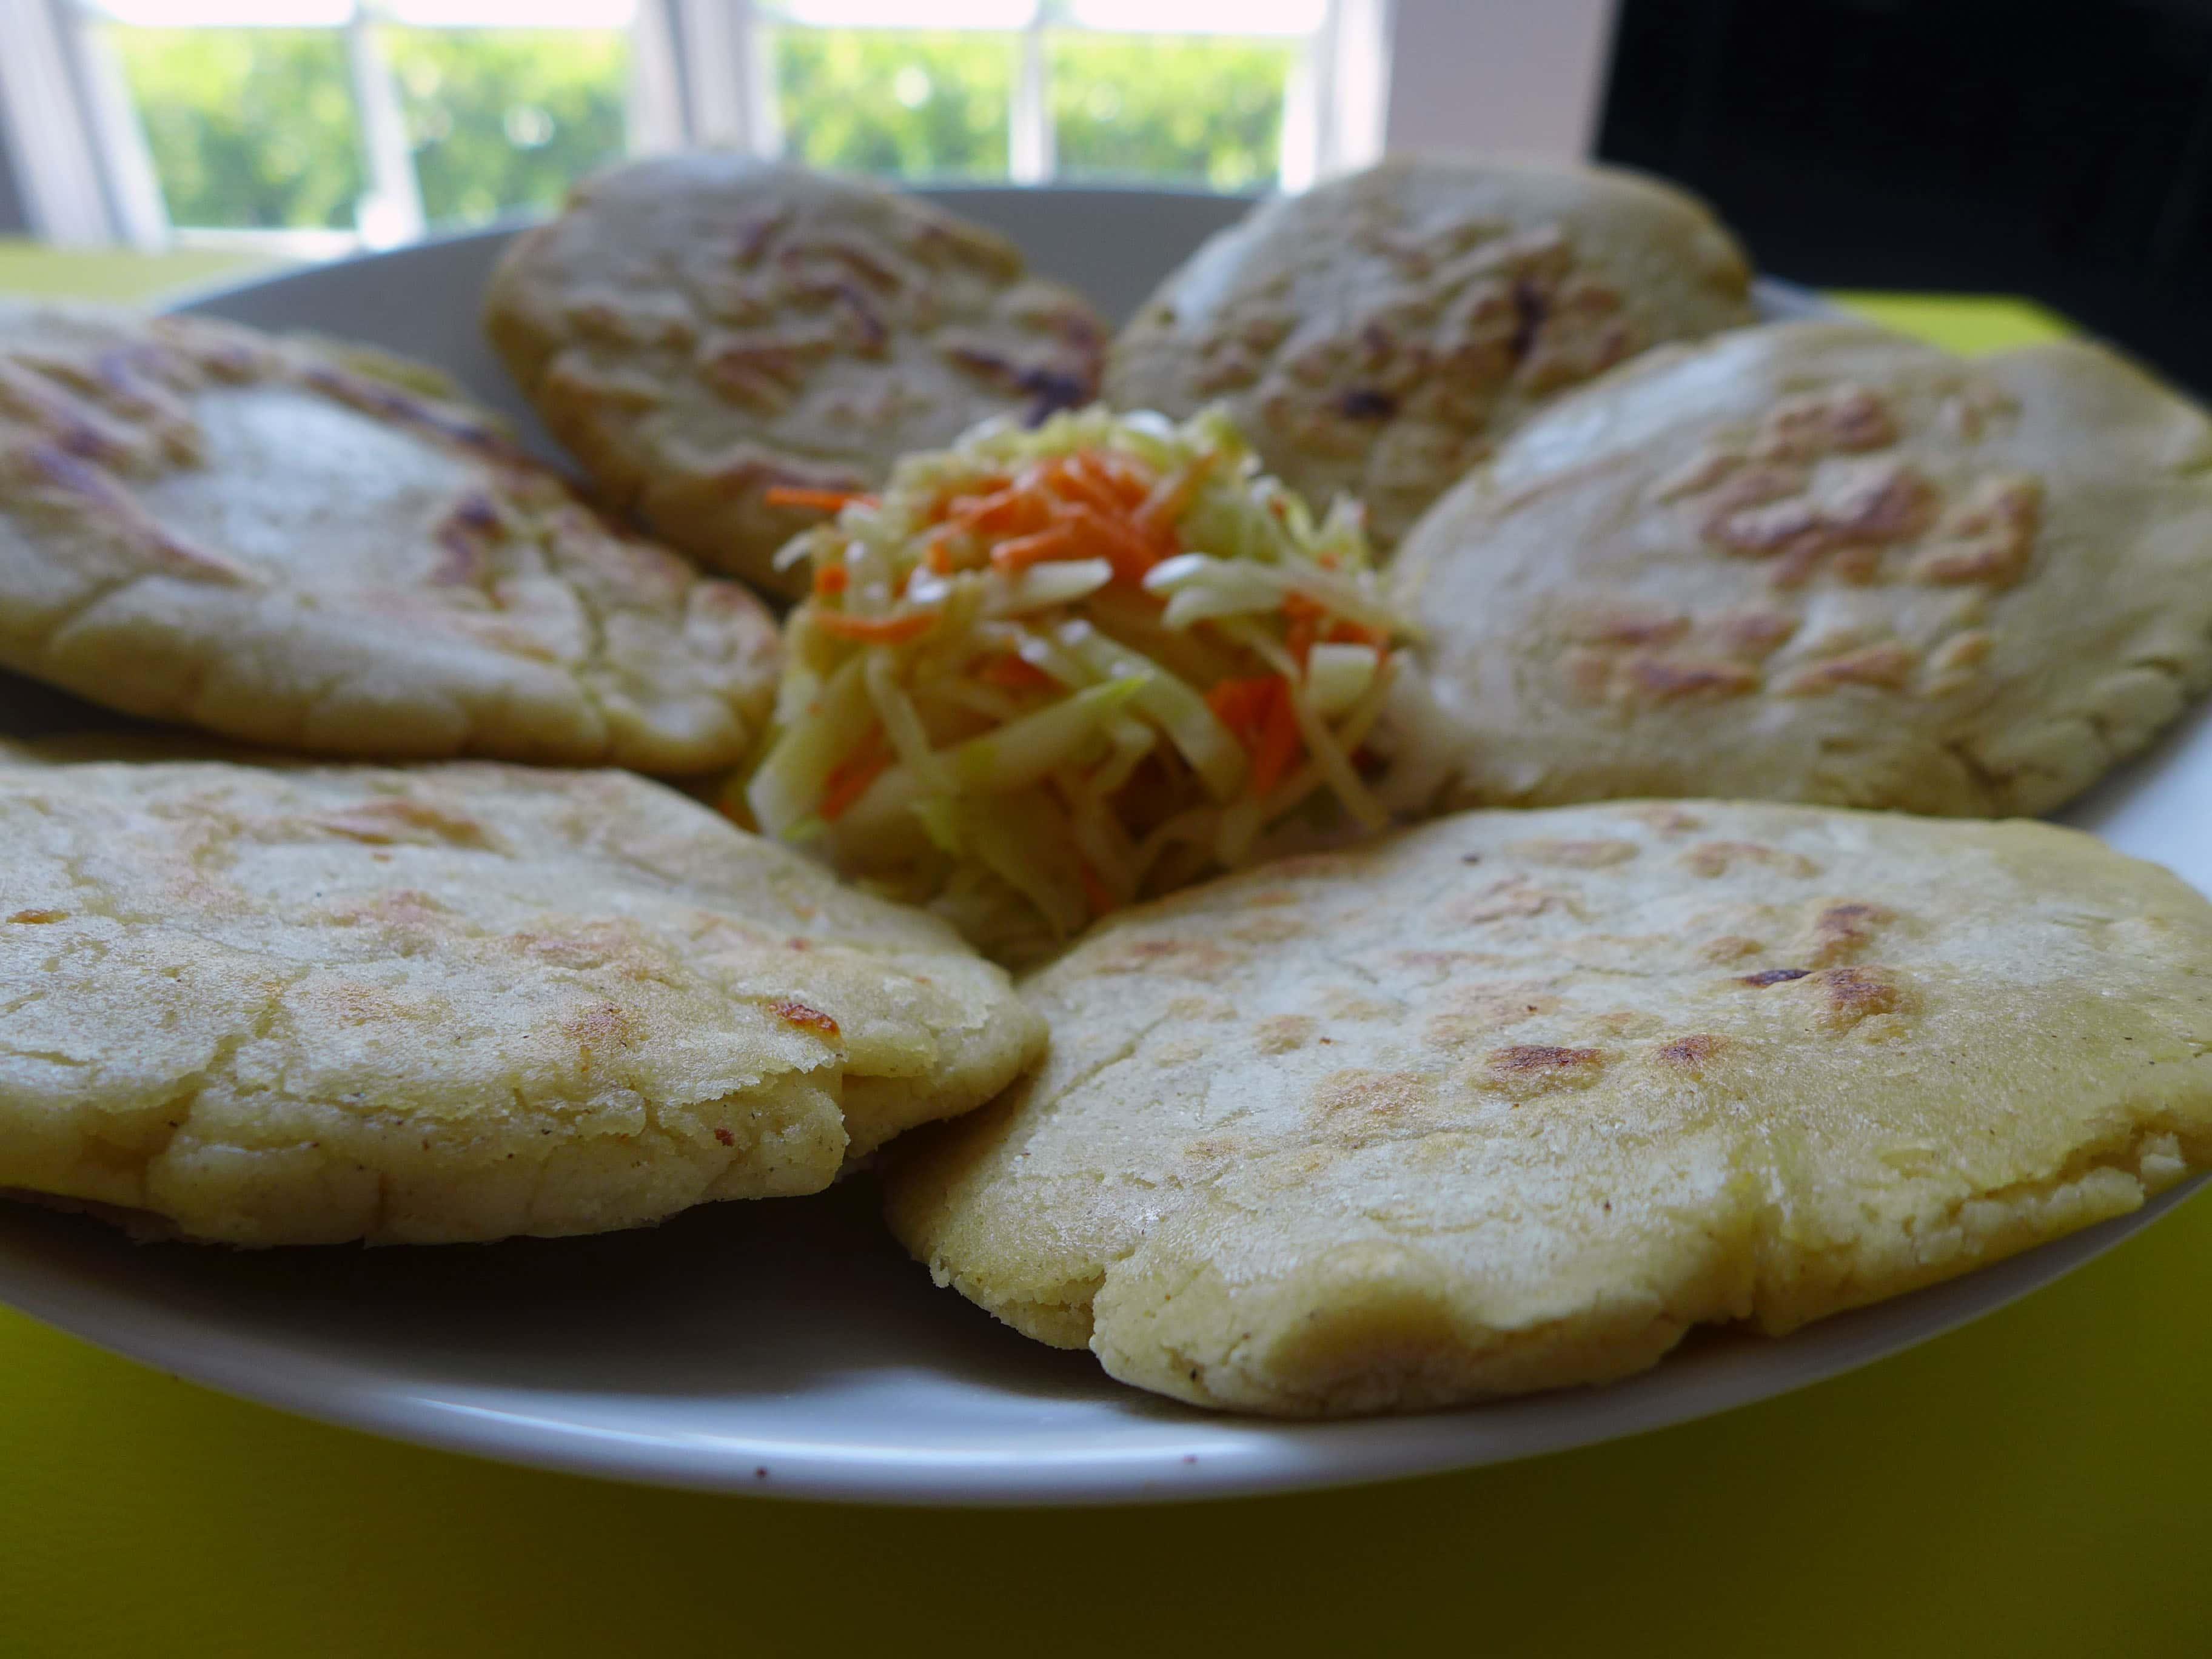 Pupusas and Curtido - Salvadorian Recipe | 196 flavors